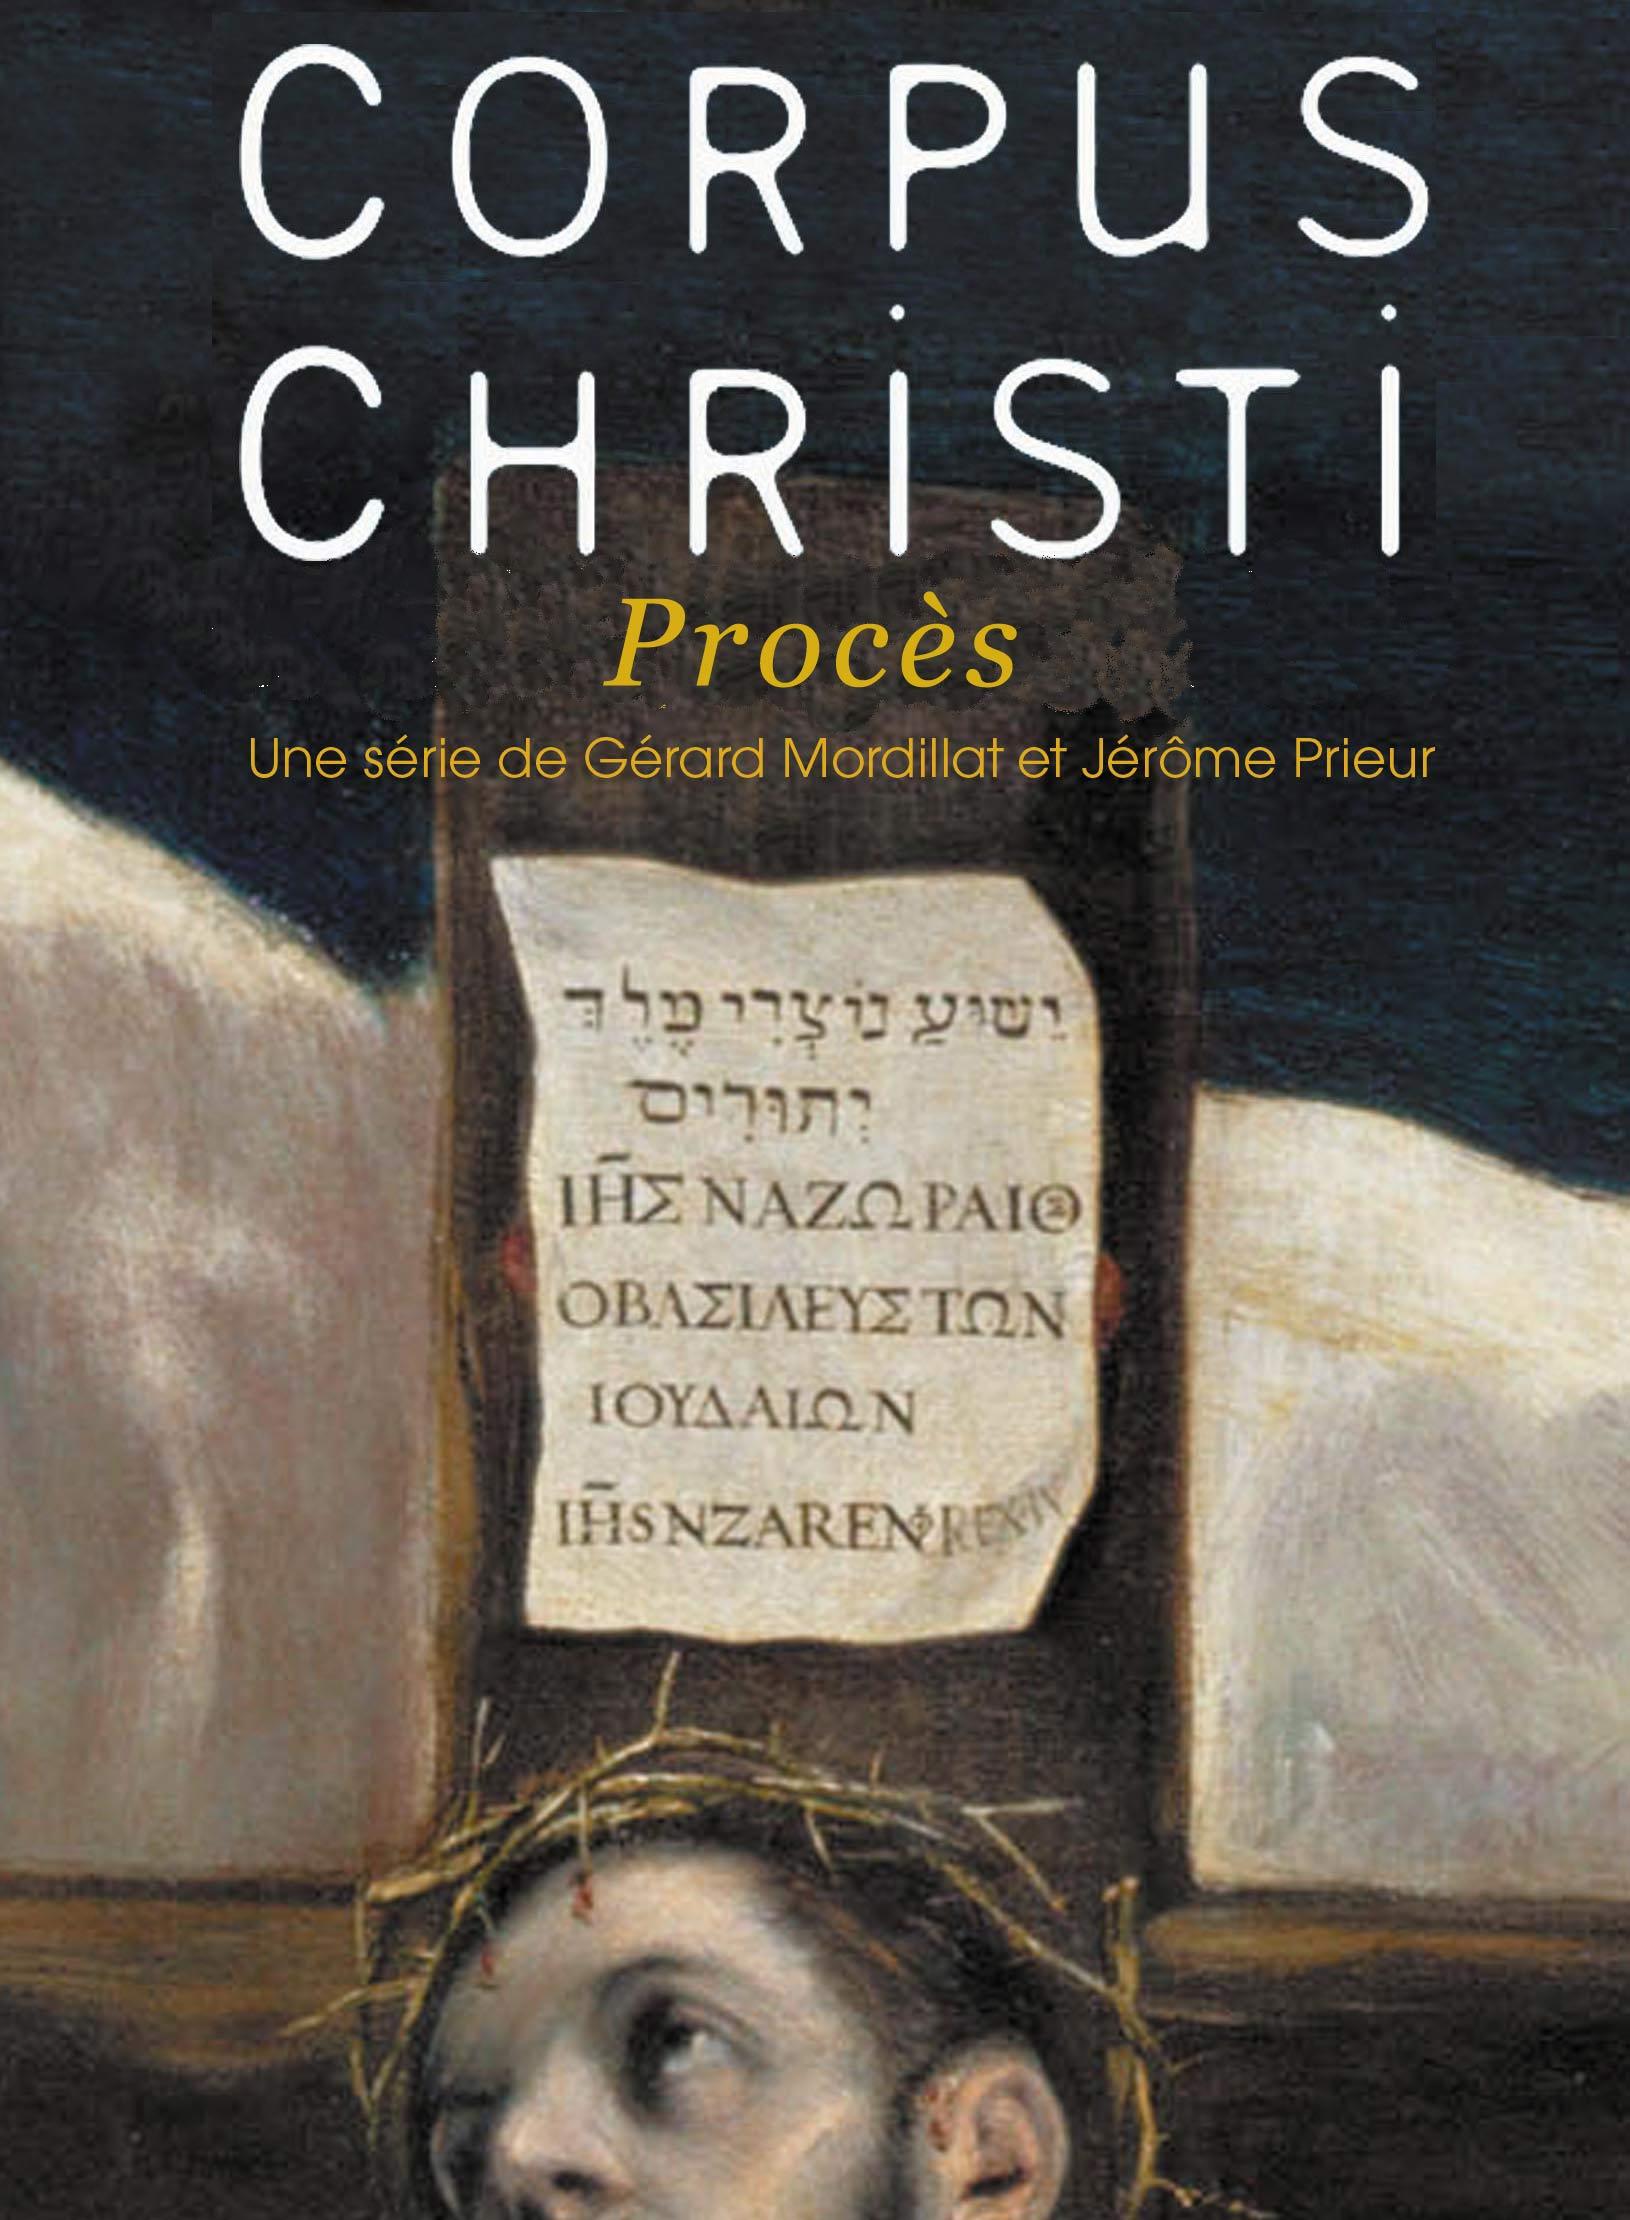 Corpus Christi - Procès | Mordillat, Gérard (Réalisateur)